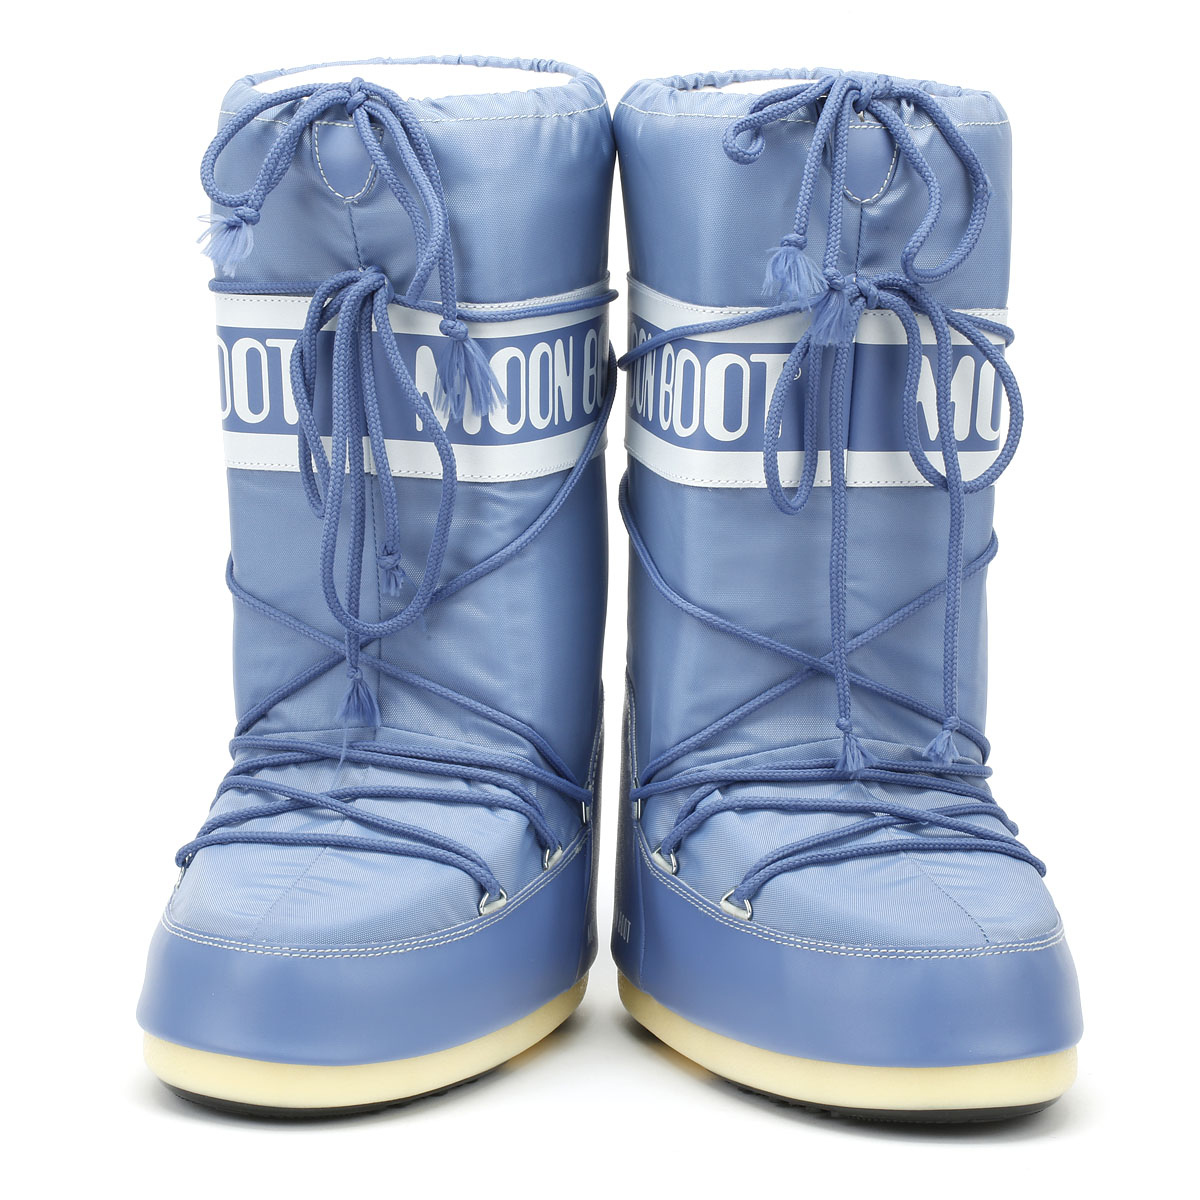 60e27fe29c47 Moon Boot Classic Icon Womens Boots Stone Wash Nylon Warm Winter Snow Shoes